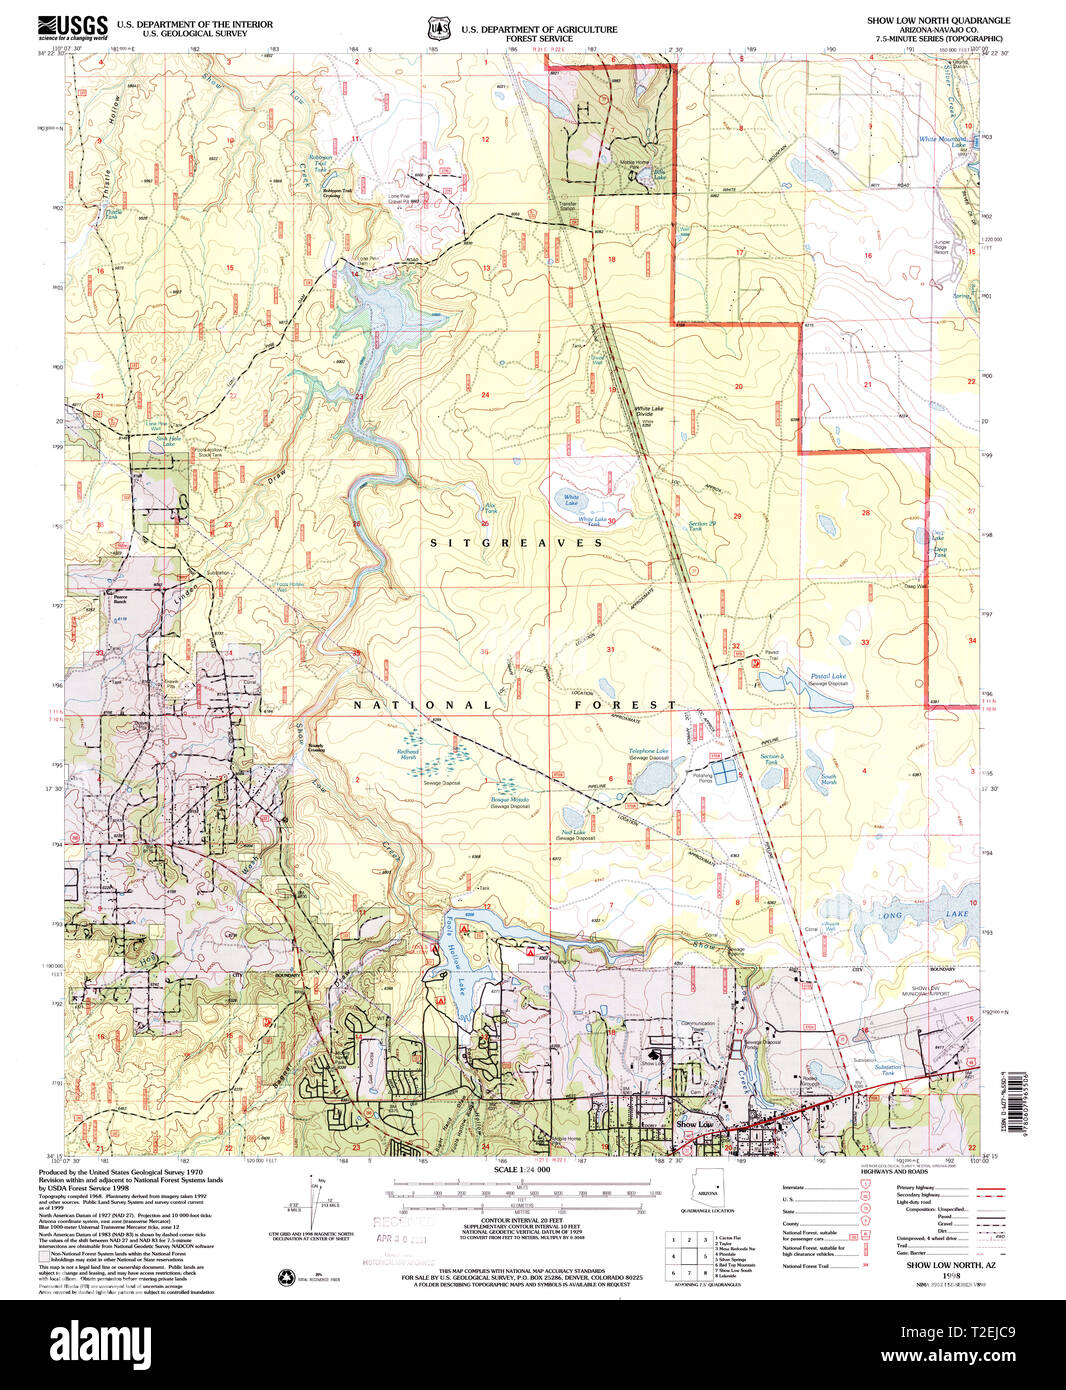 Show Map Of Arizona.Usgs Topo Map Arizona Az Show Low North 313369 1998 24000